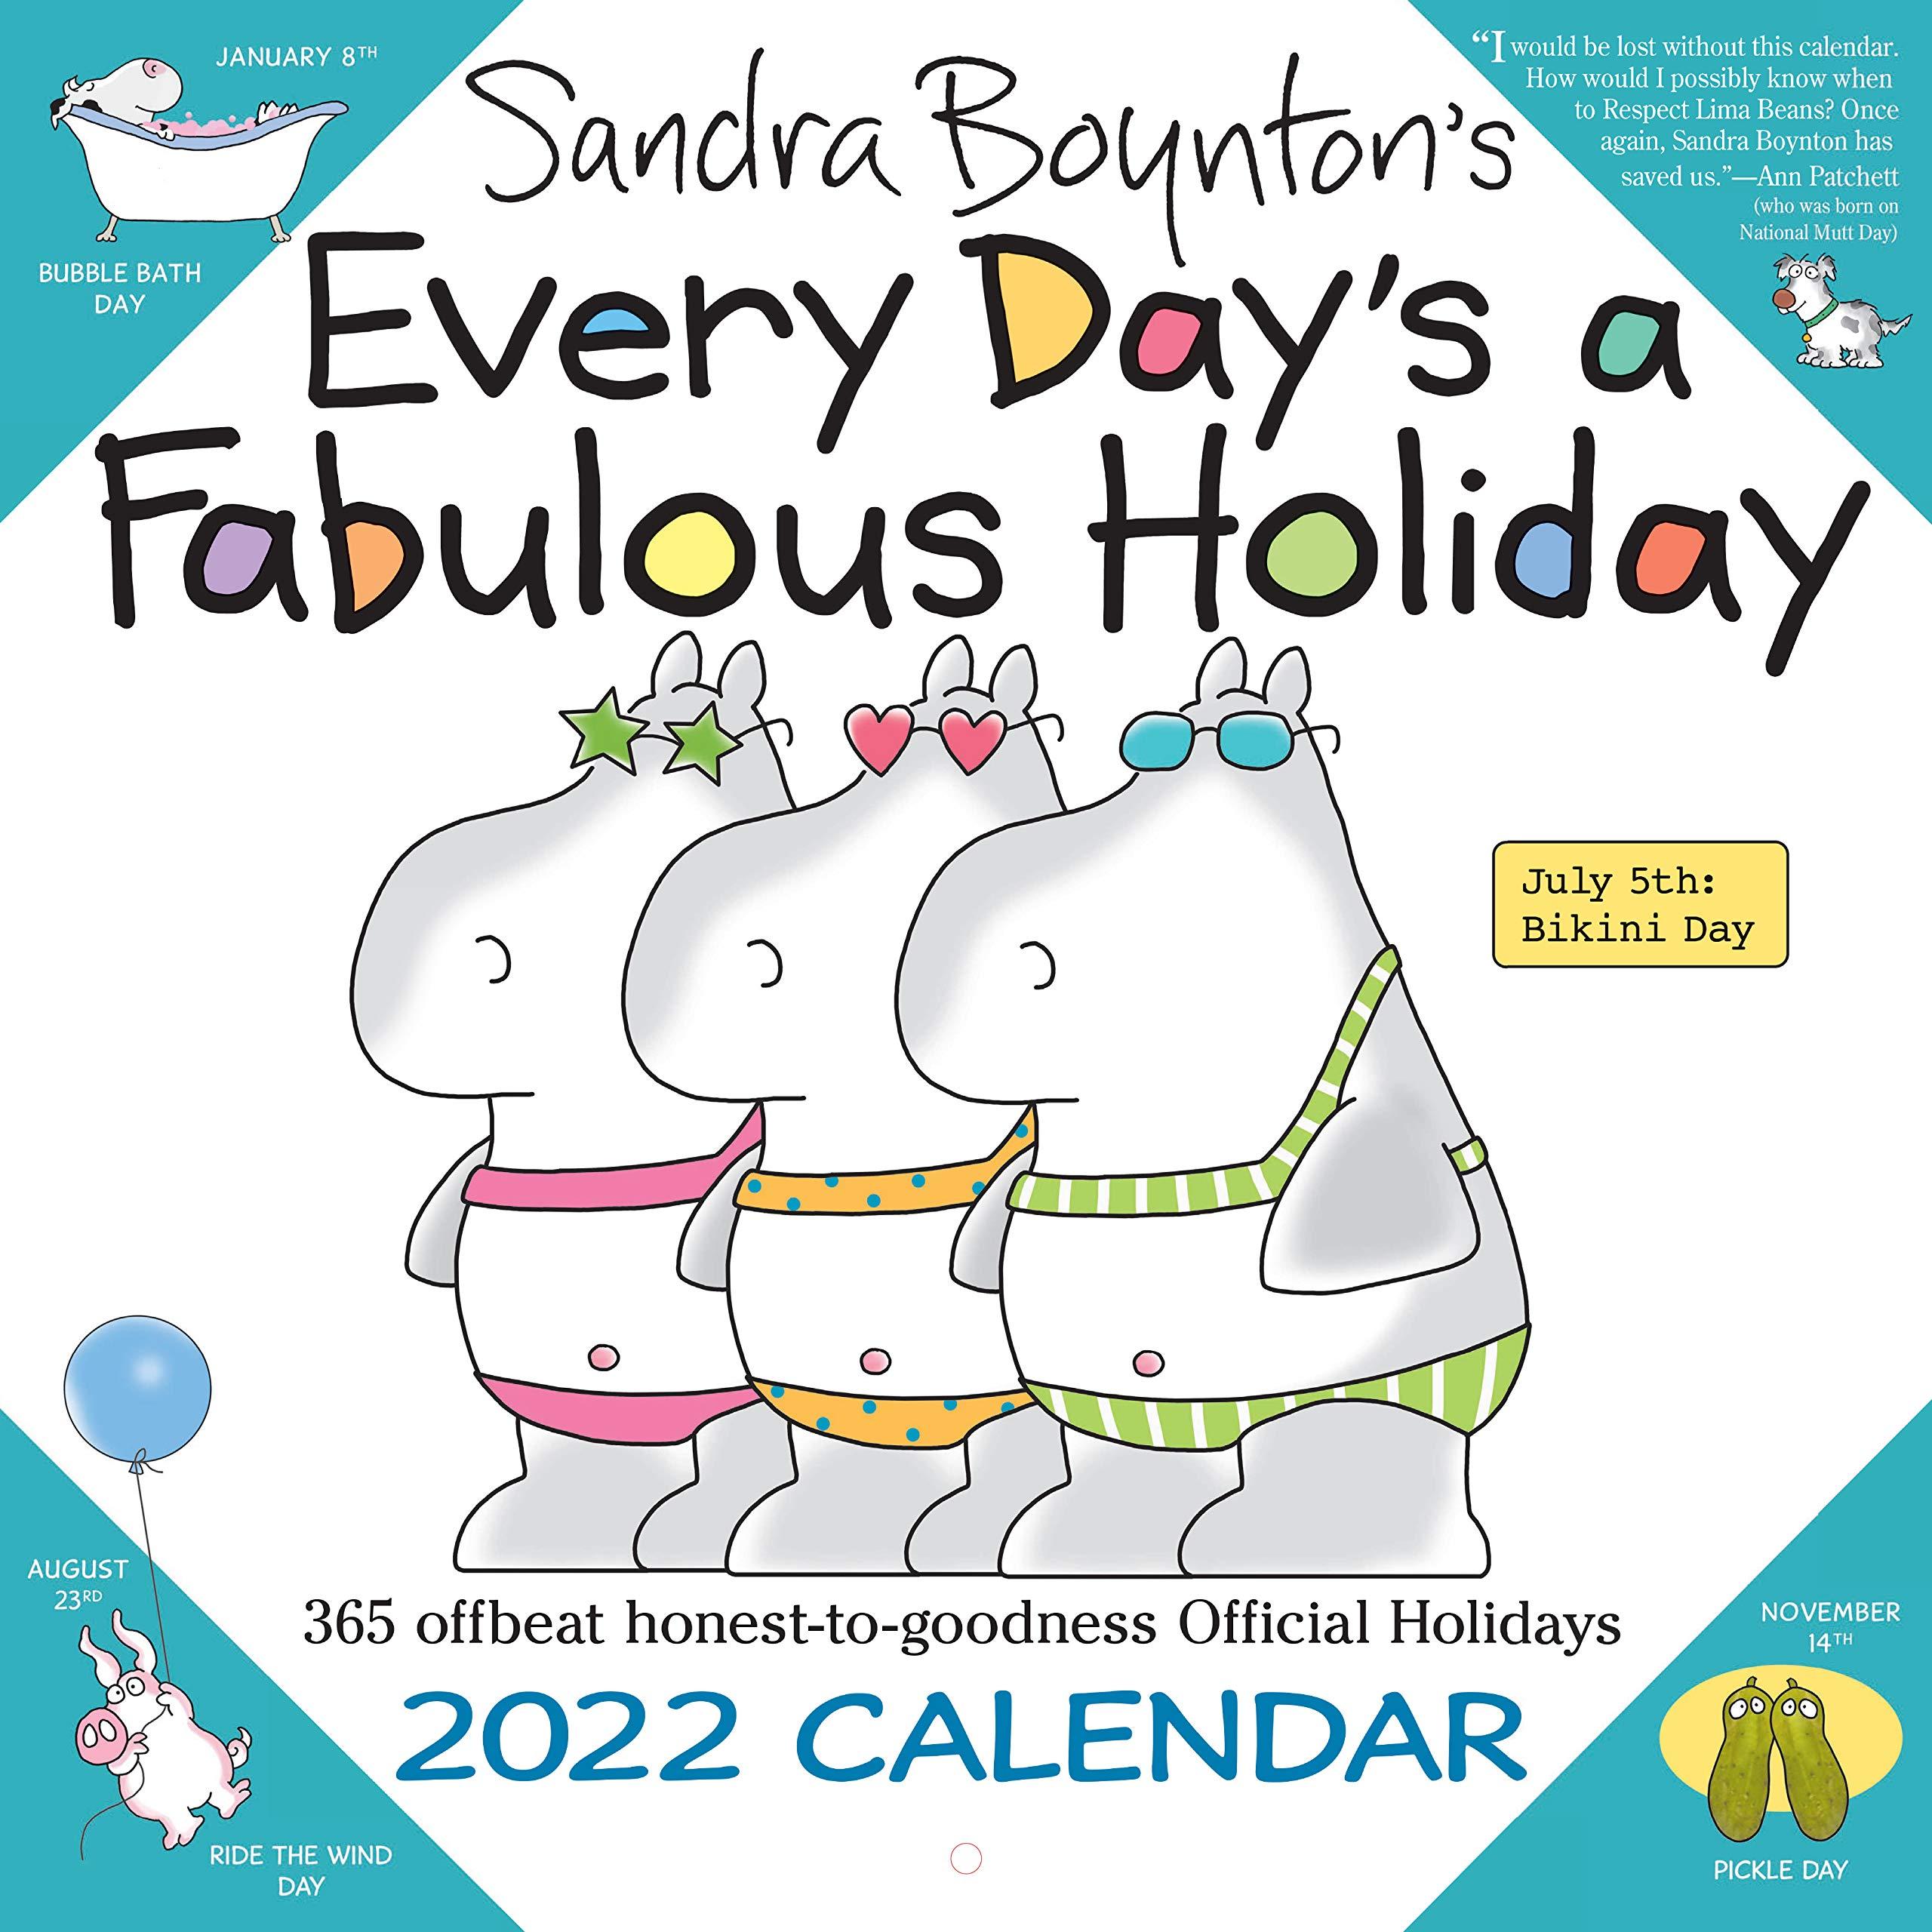 National Day Calendar 2022.